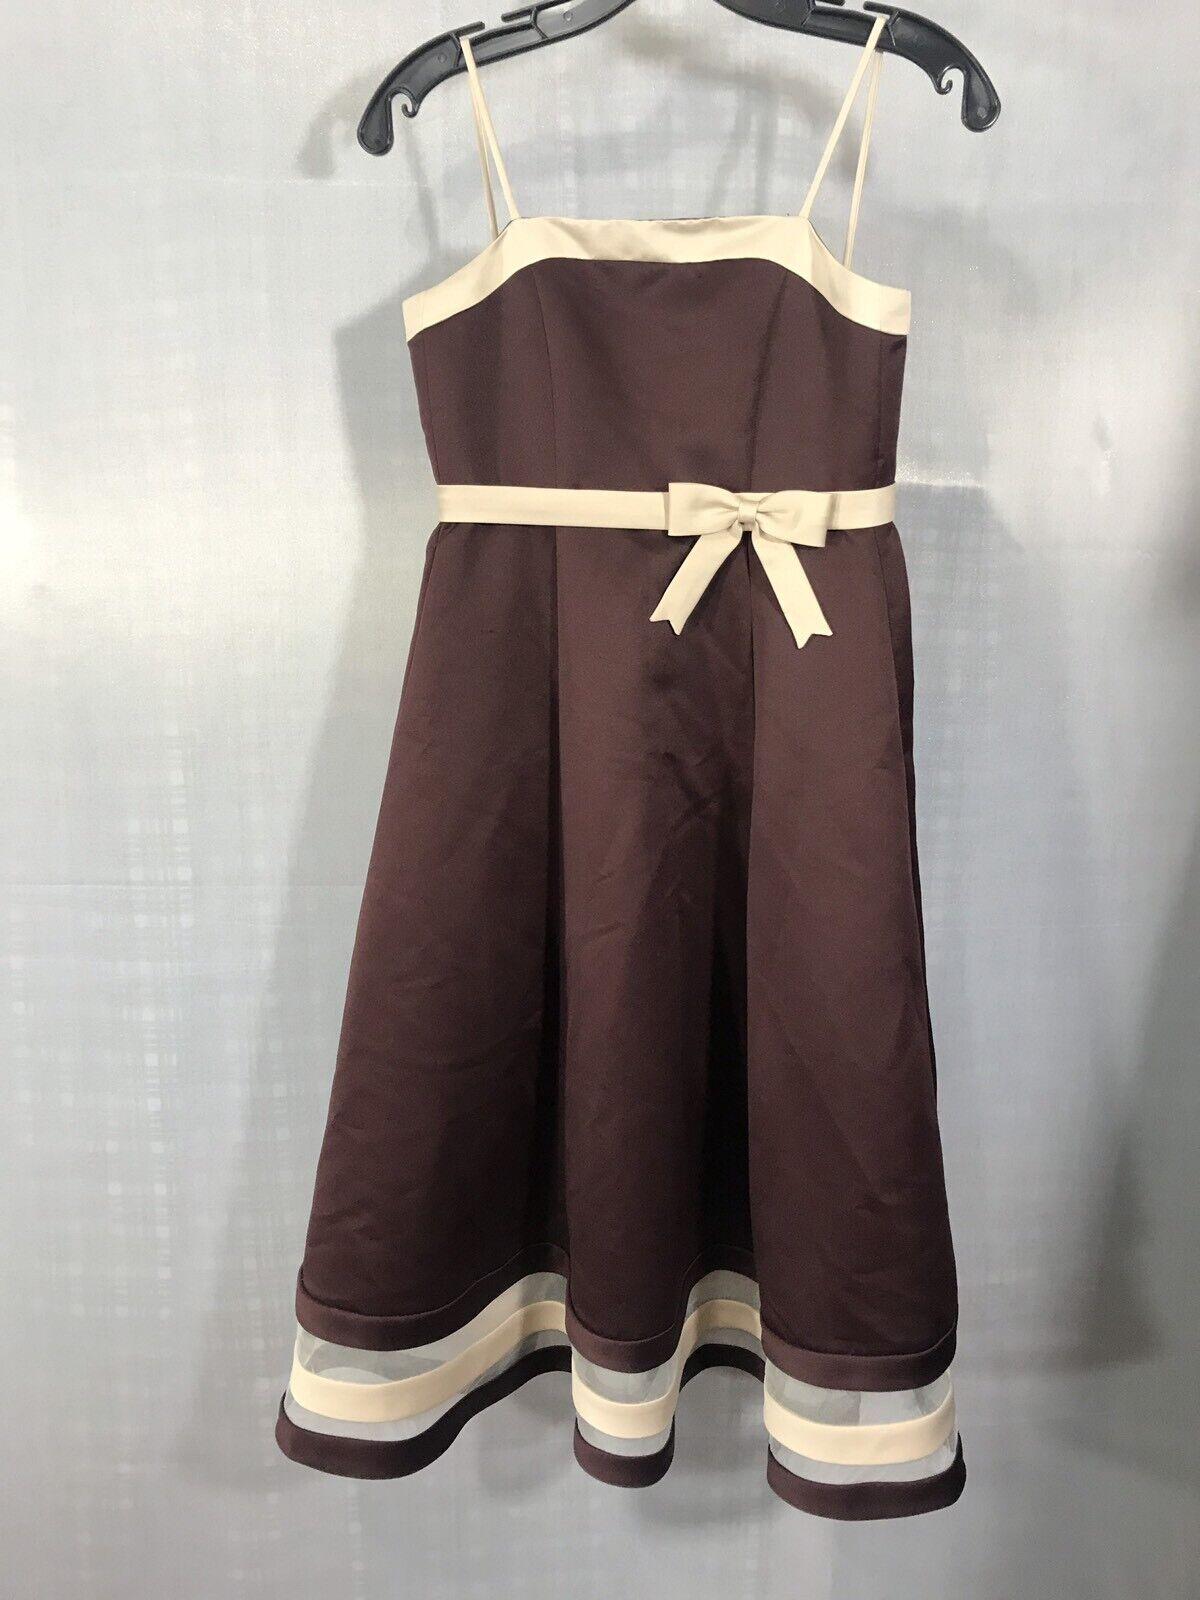 Eden Bridals Dress Princess Flower Girl Size 6 Bridesmaid Bow Brown Cream Formal